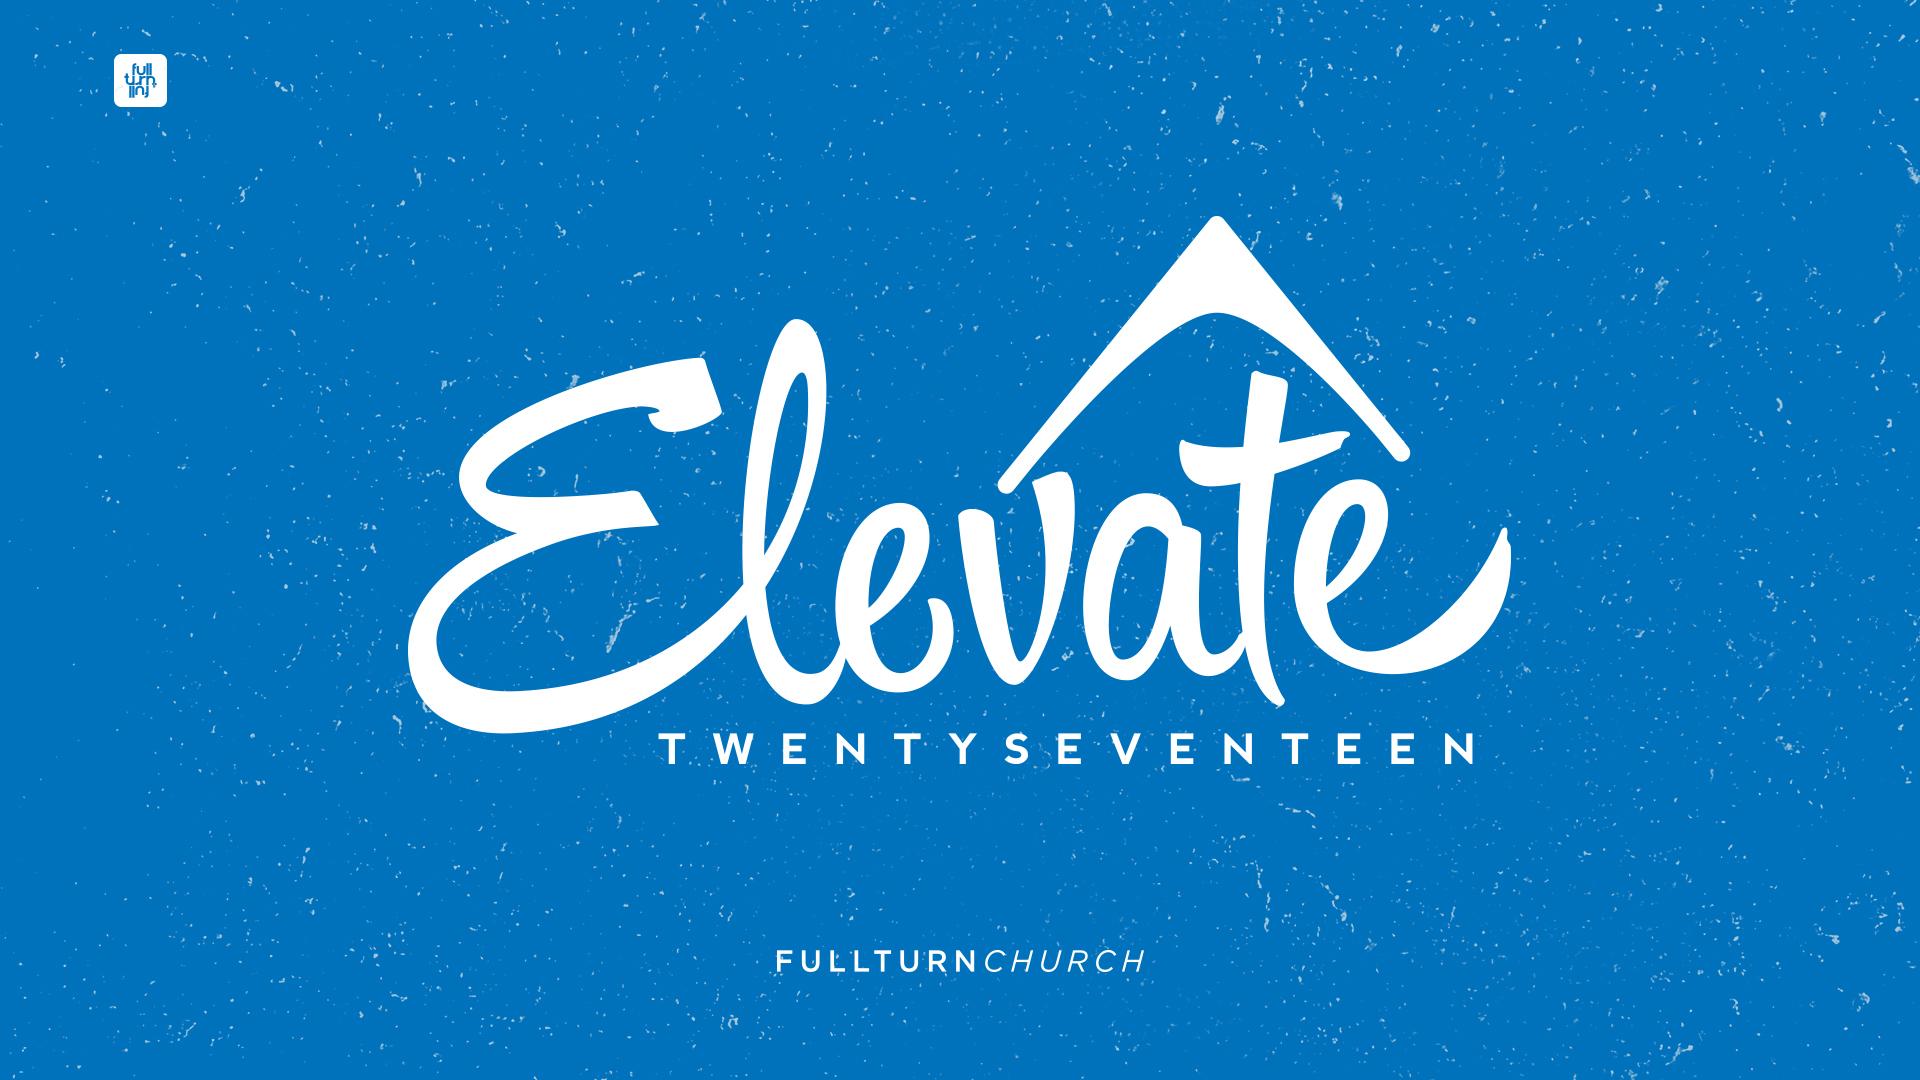 elevate_twentyseventeen_screen